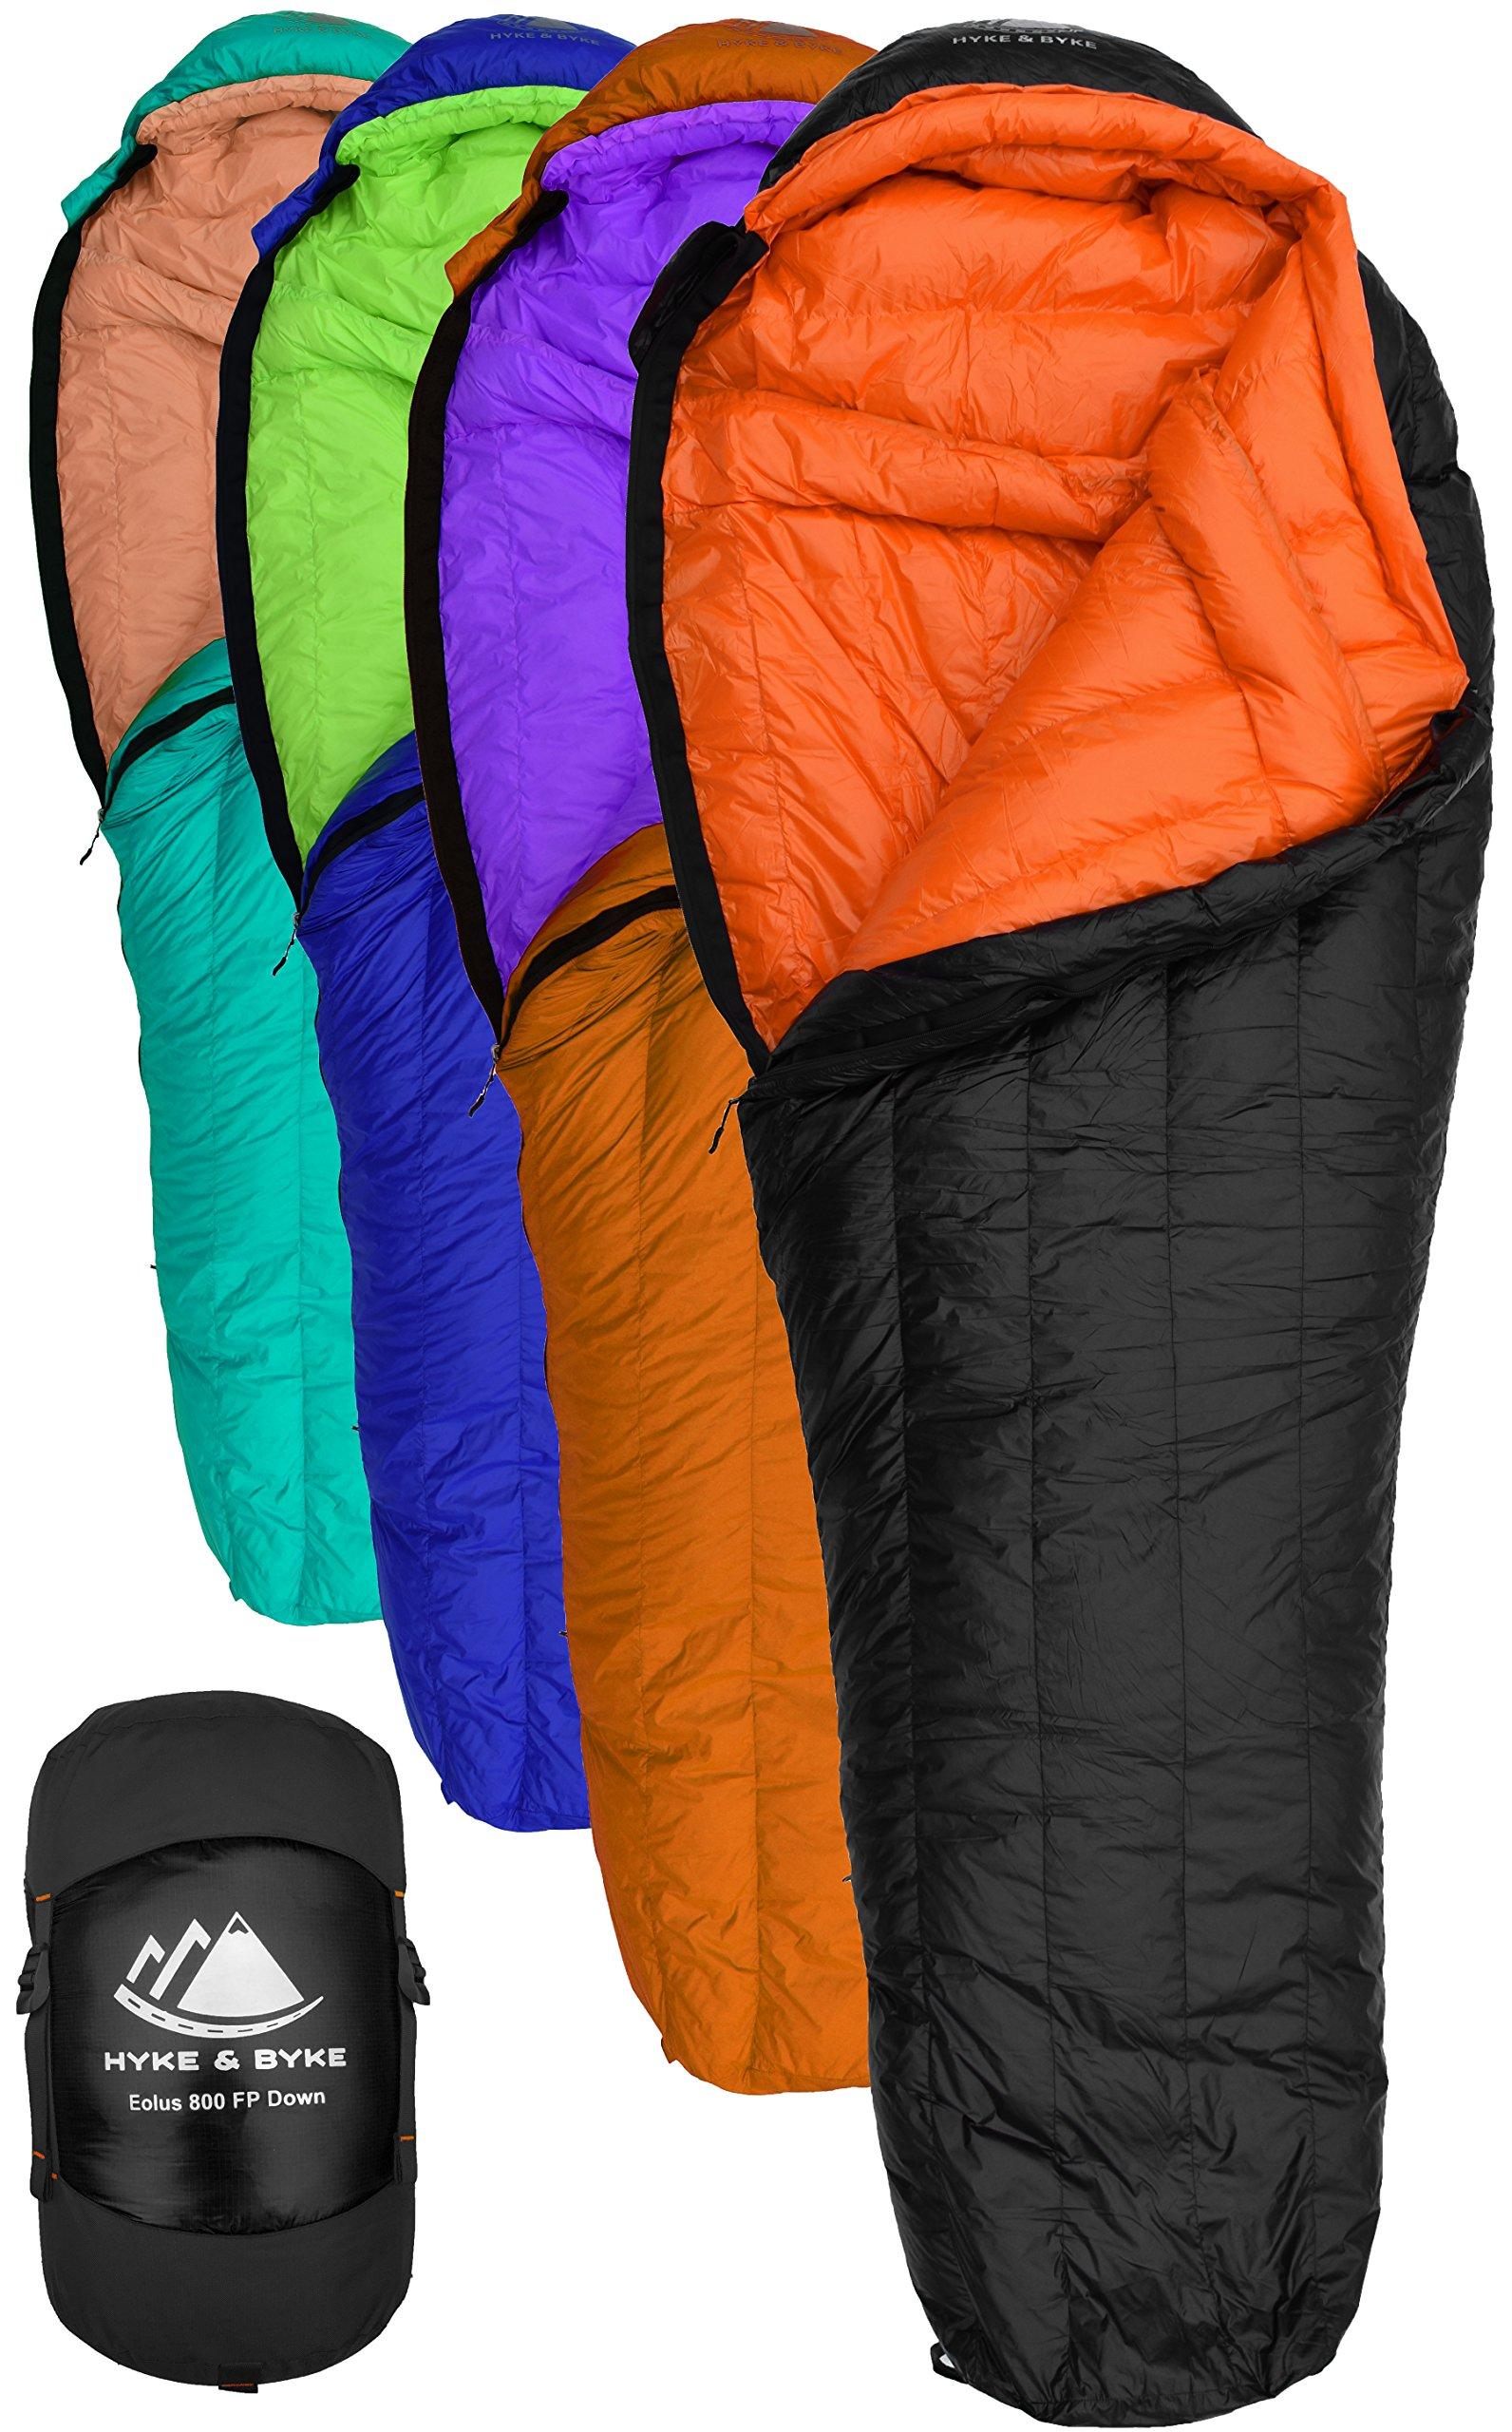 Hyke & Byke Eolus 15 & 30 Degree F 800 Fill Power Hydrophobic Goose Down Sleeping Bag with ClusterLoft Base - Ultra Lightweight 3 Season Men's and Women's Mummy Bag Designed for Backpacking 3